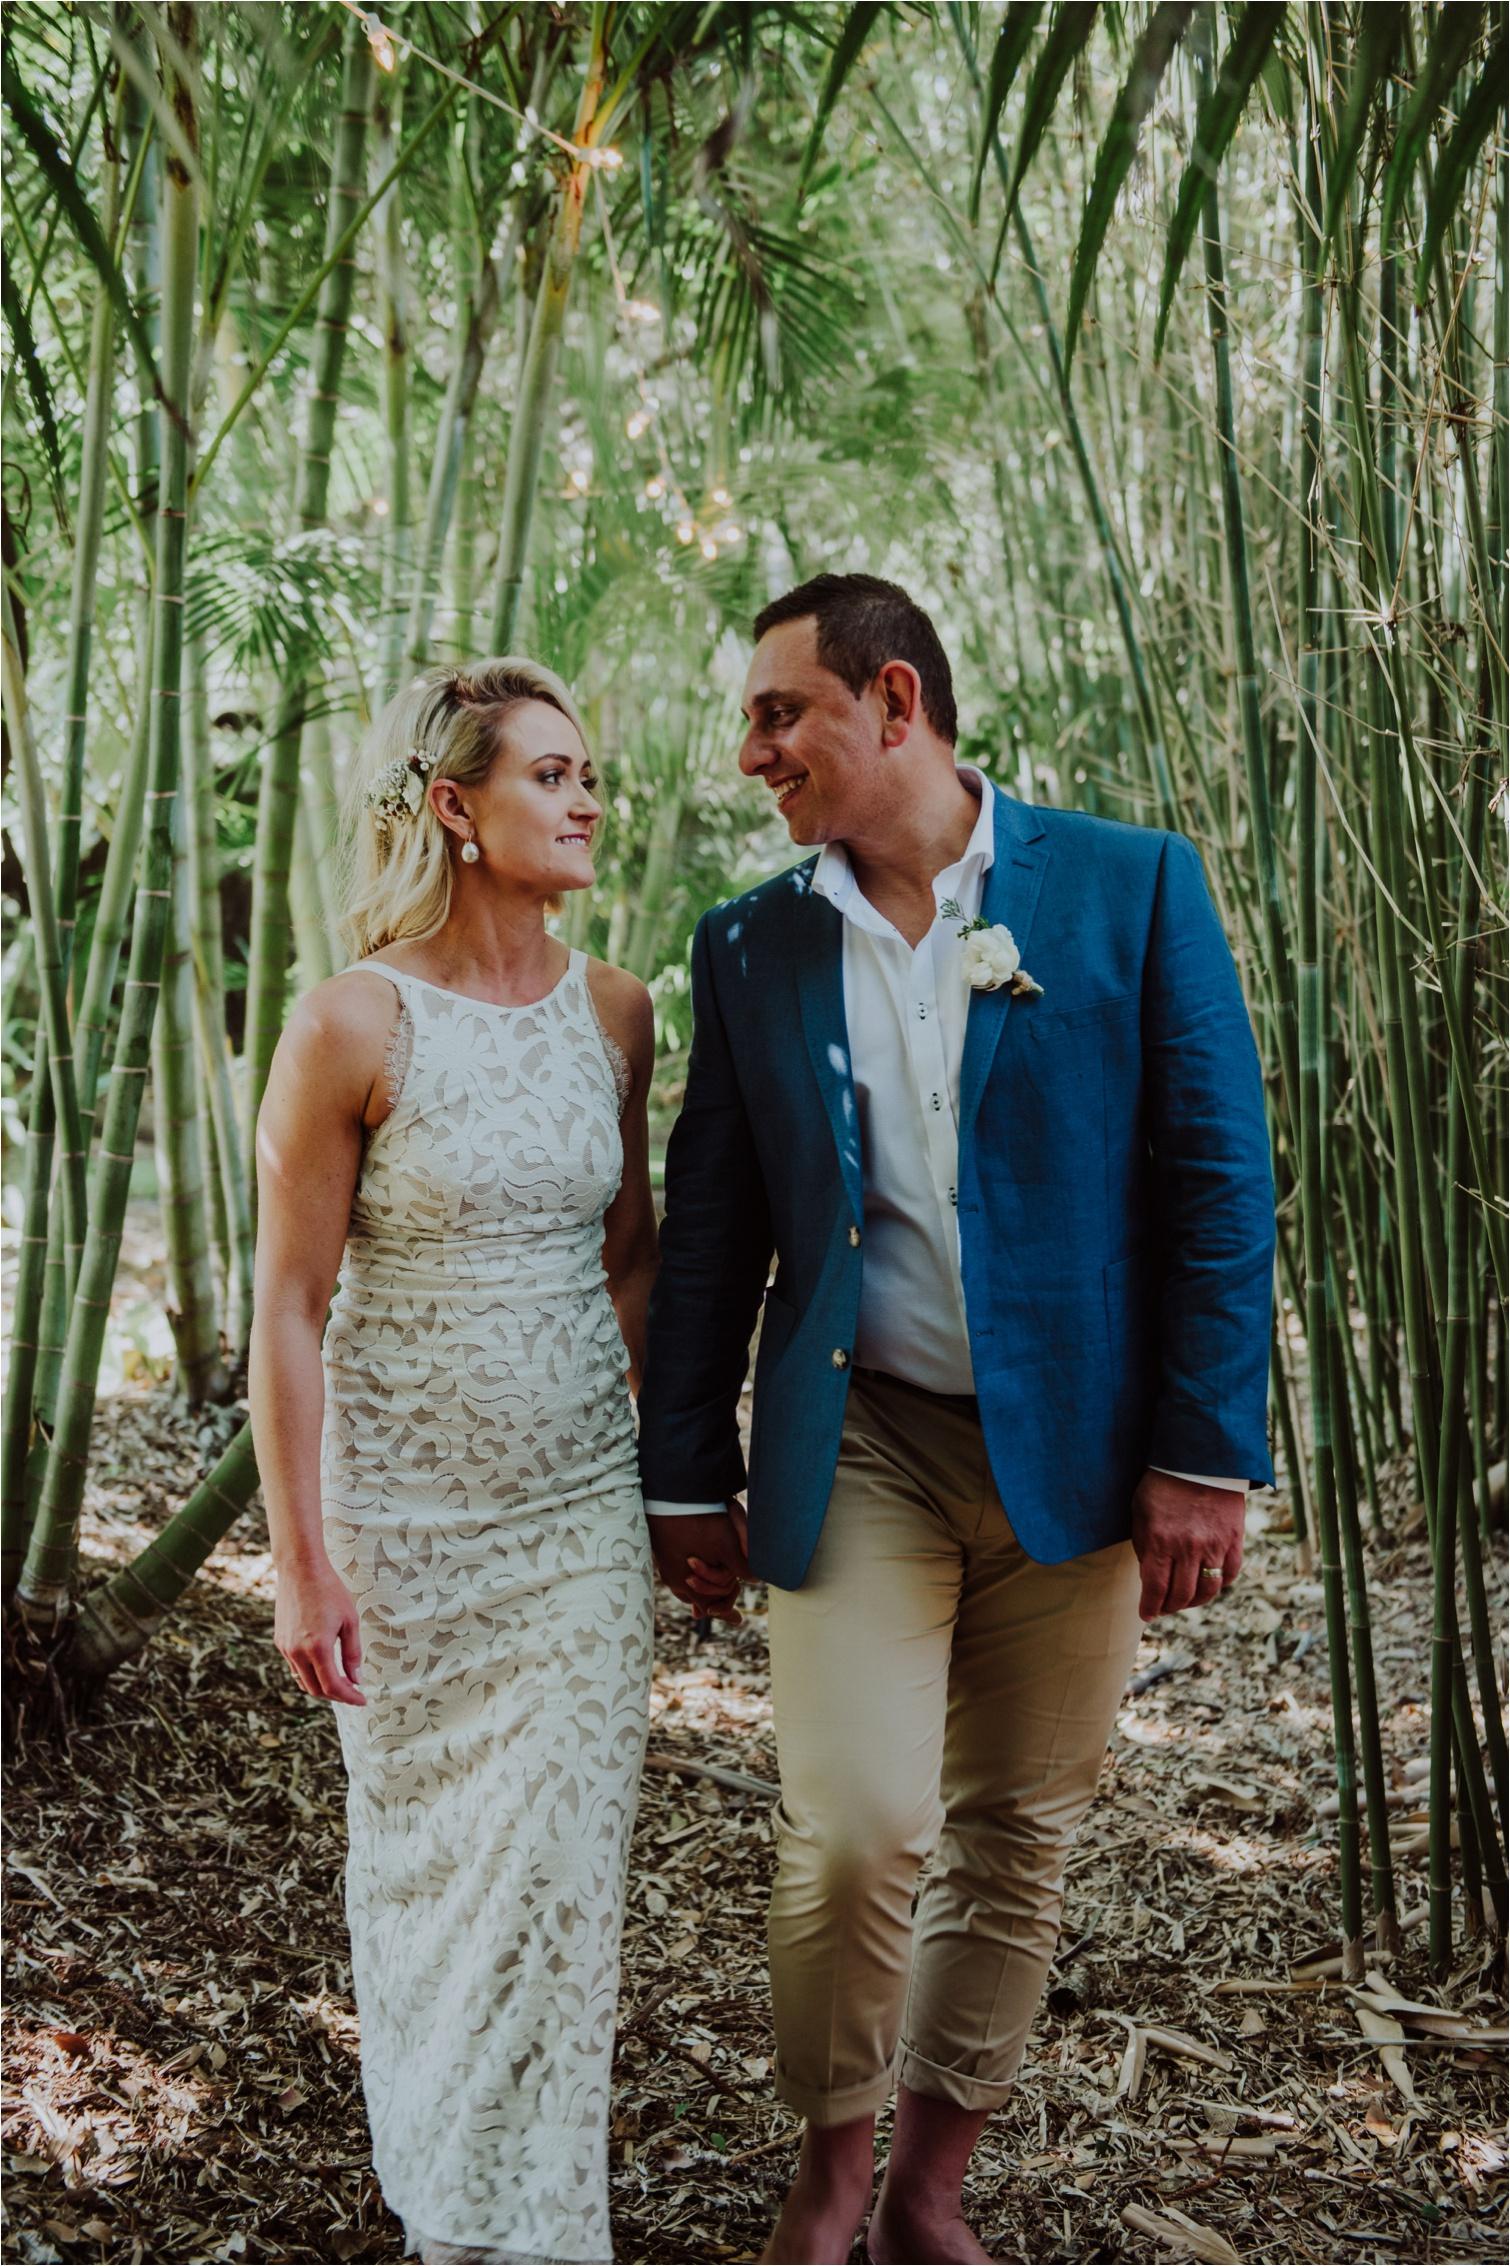 Candid bridal session by byron bay wedding photographer